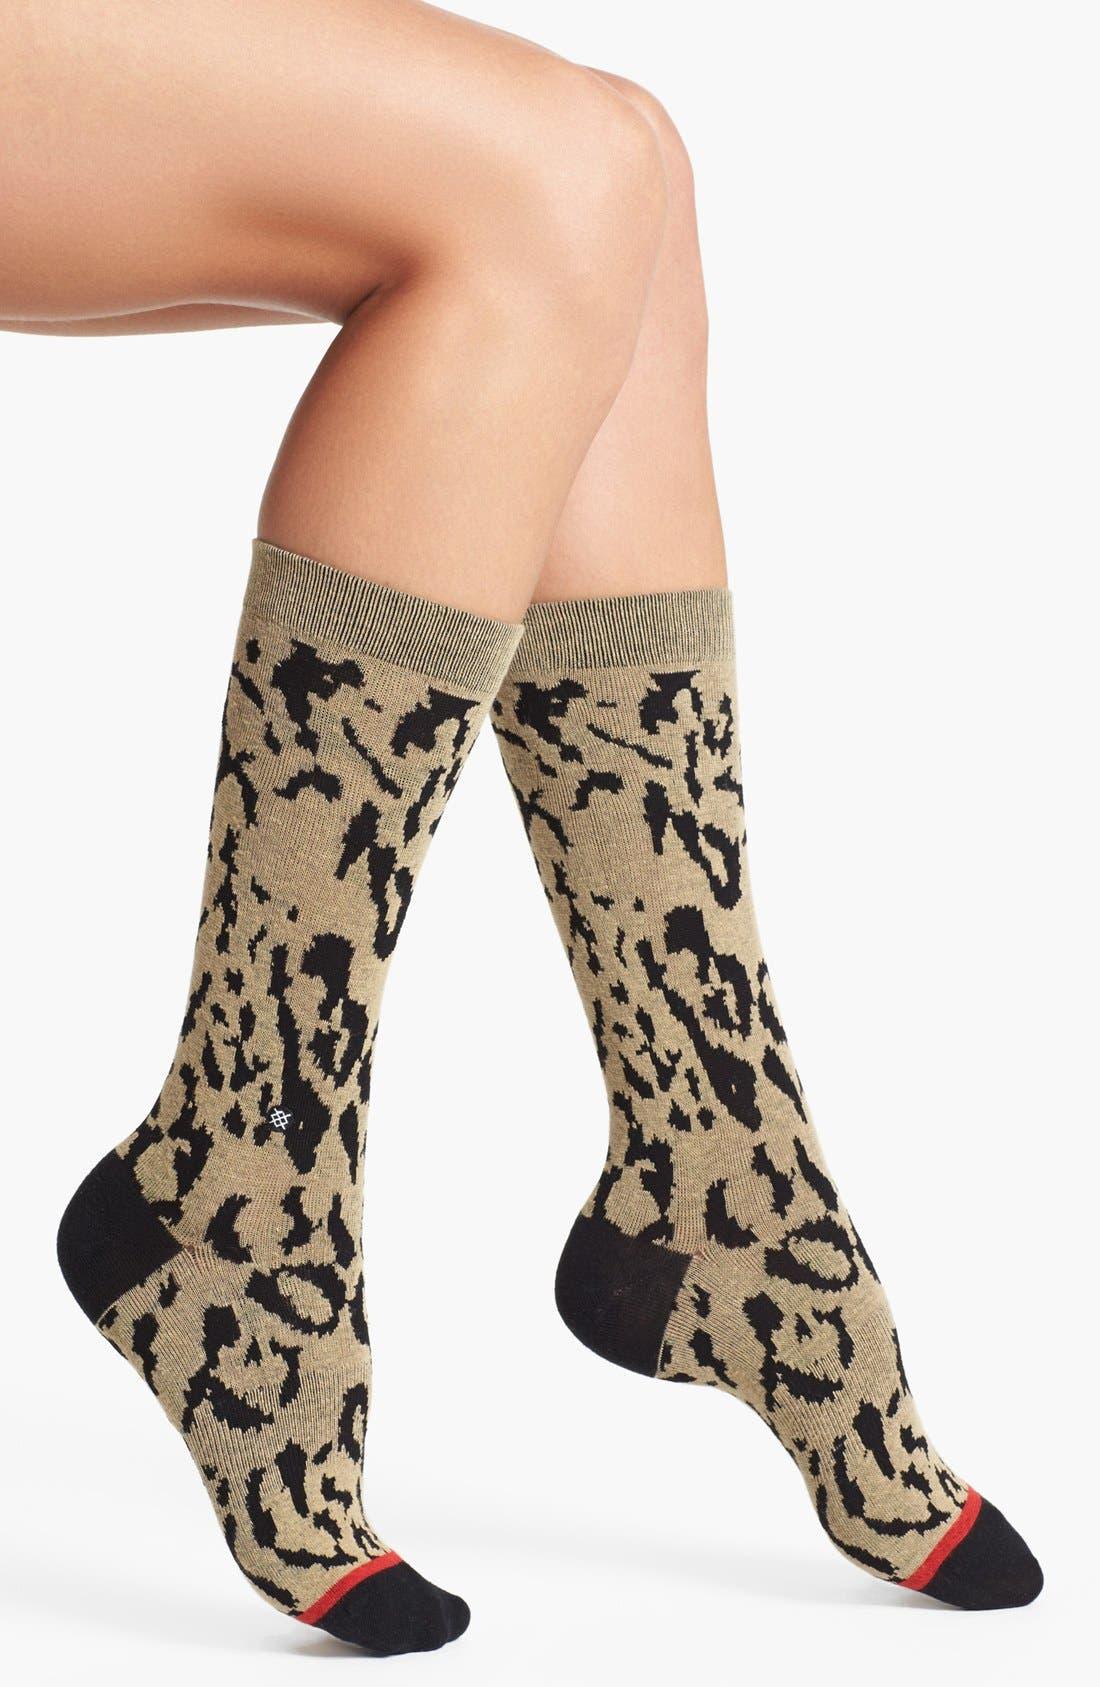 Main Image - Stance 'Cheetah' Crew Socks